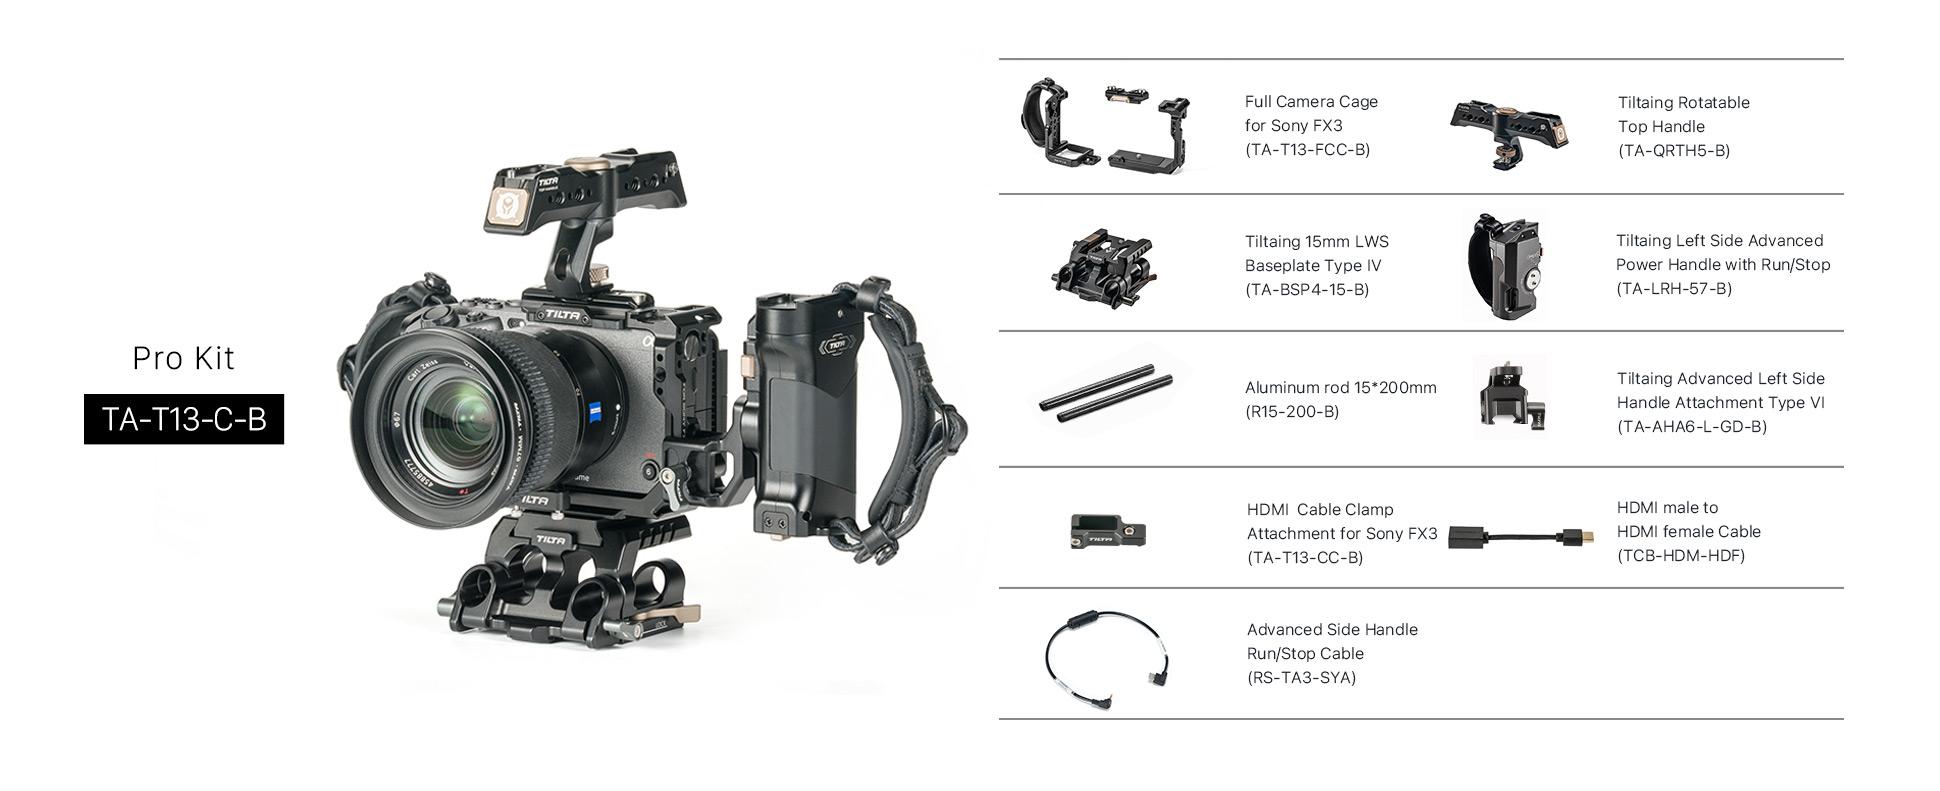 tech-specs-FX3-pro-kit